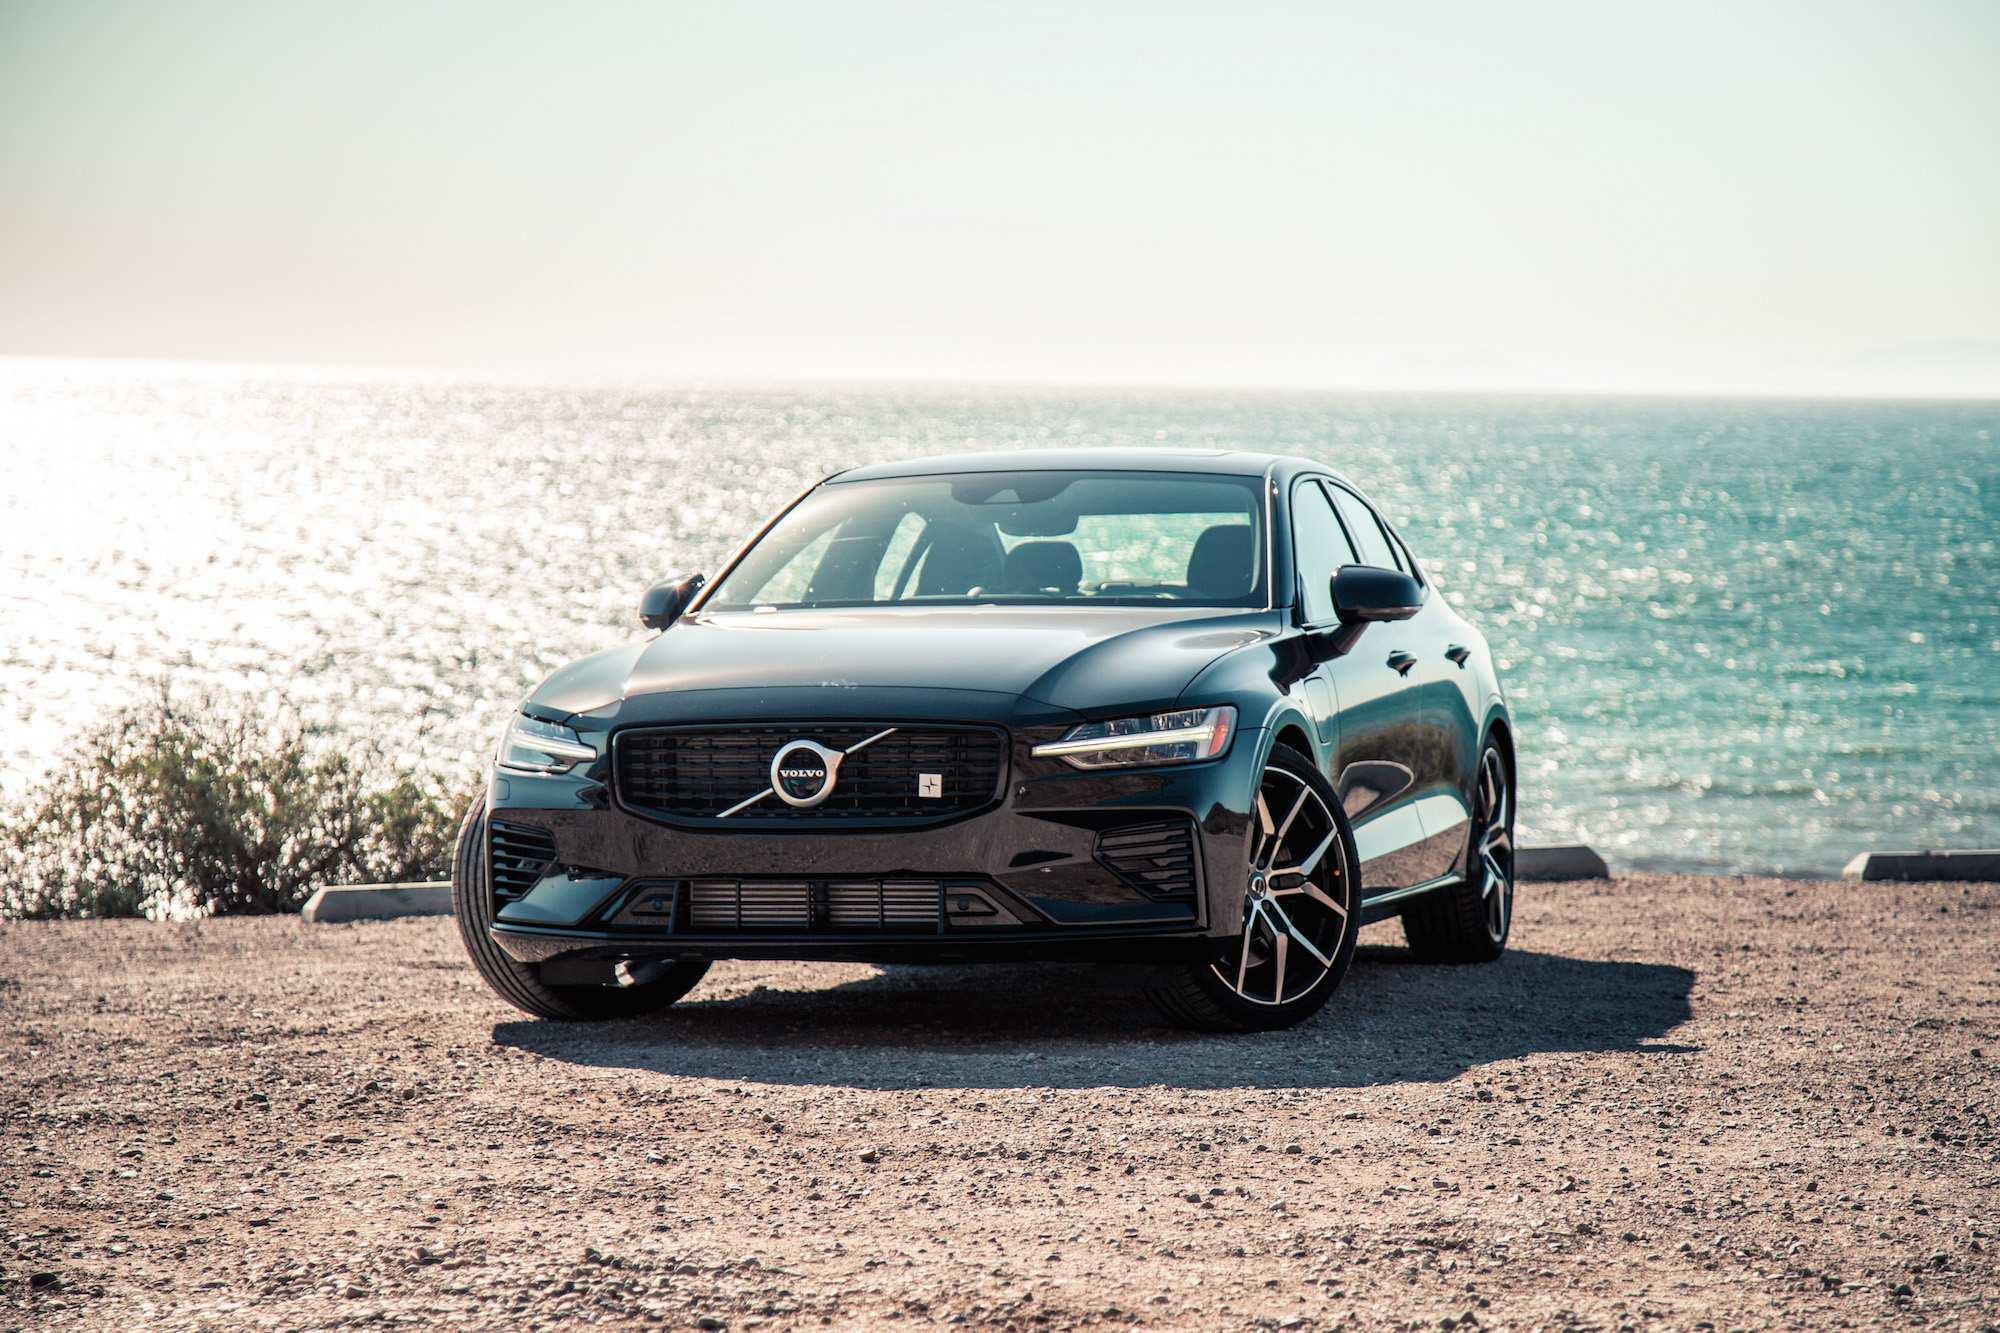 56 New Volvo Polestar 2020 Overview for Volvo Polestar 2020